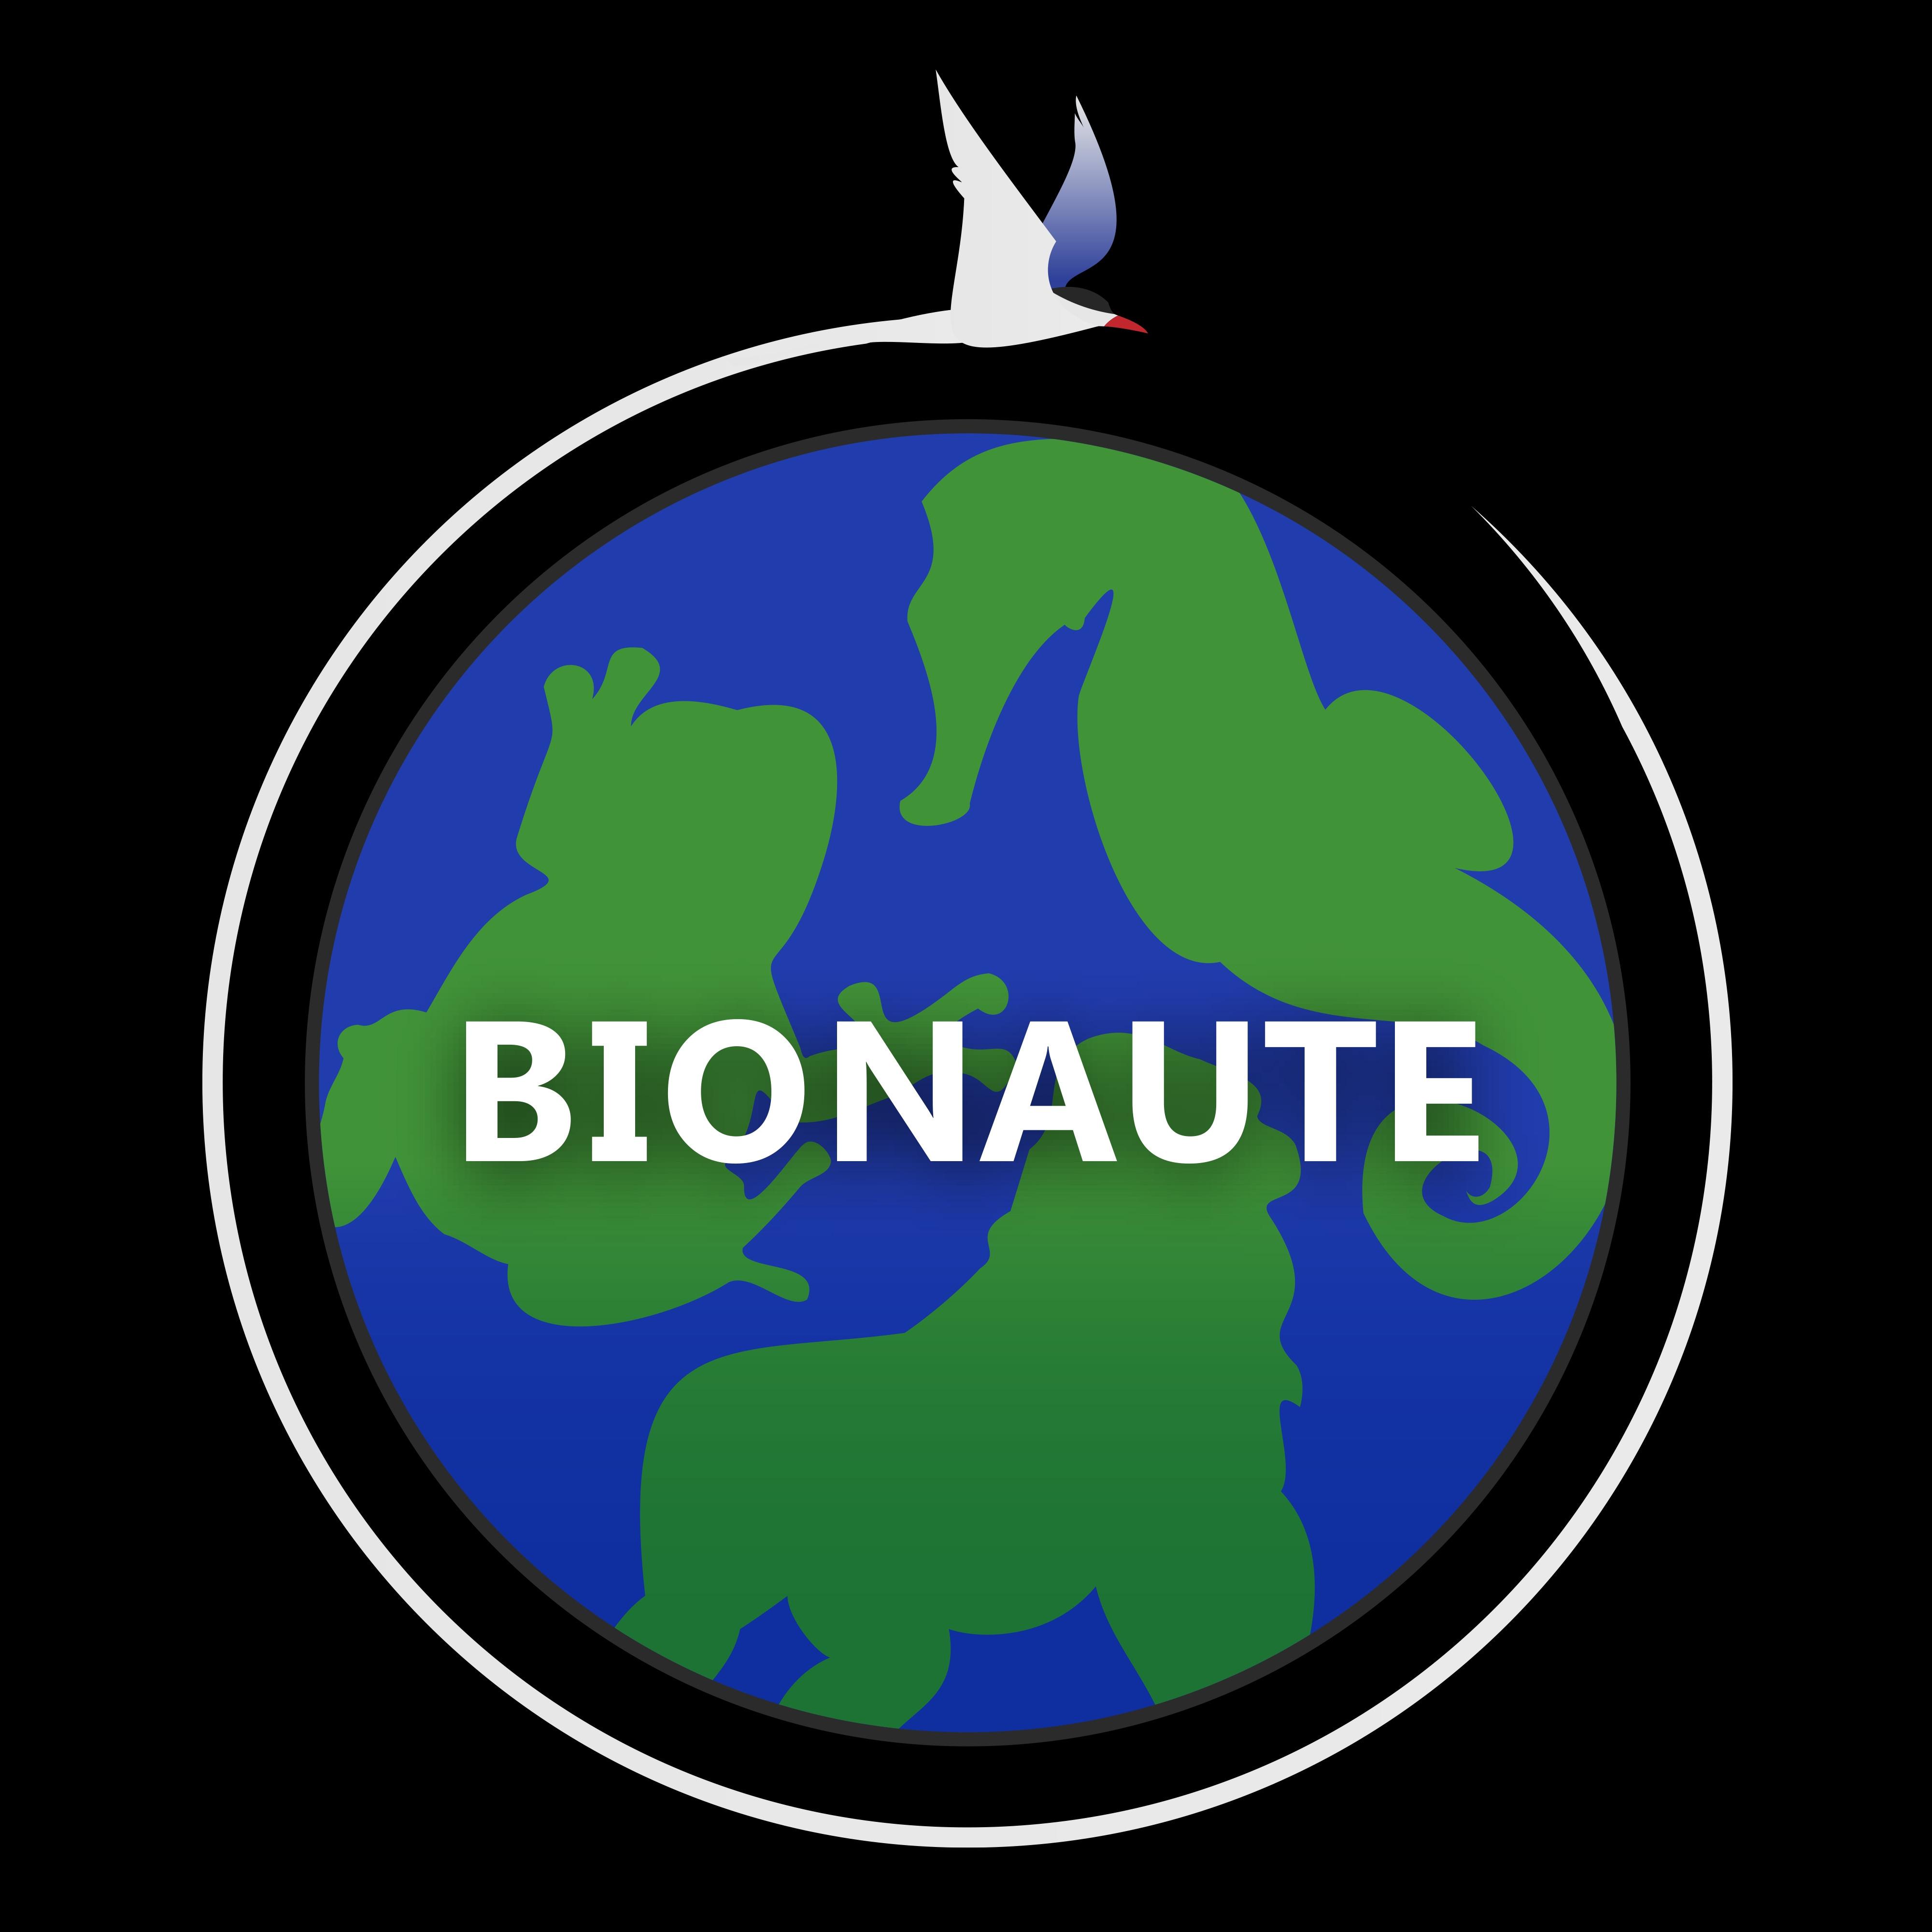 @Bionaute Profile Image | Linktree